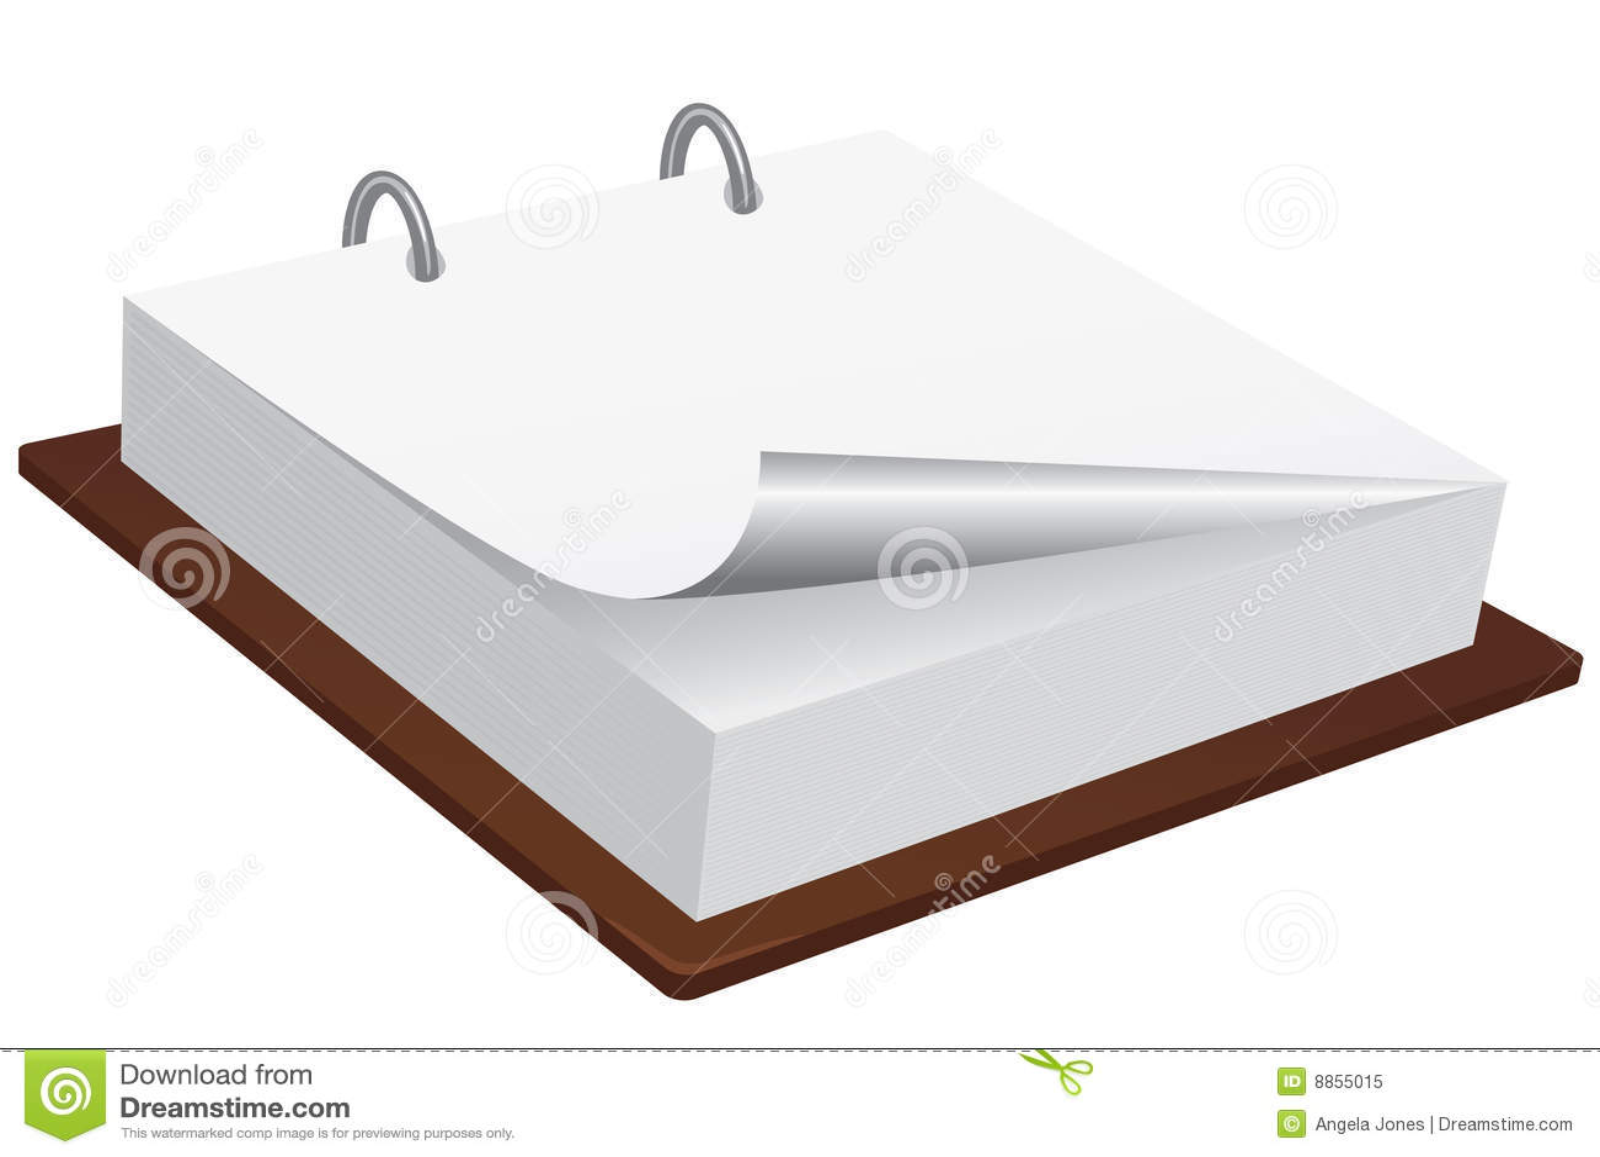 Blank Memo Pad Royalty Free Stock Photo Image 8855015